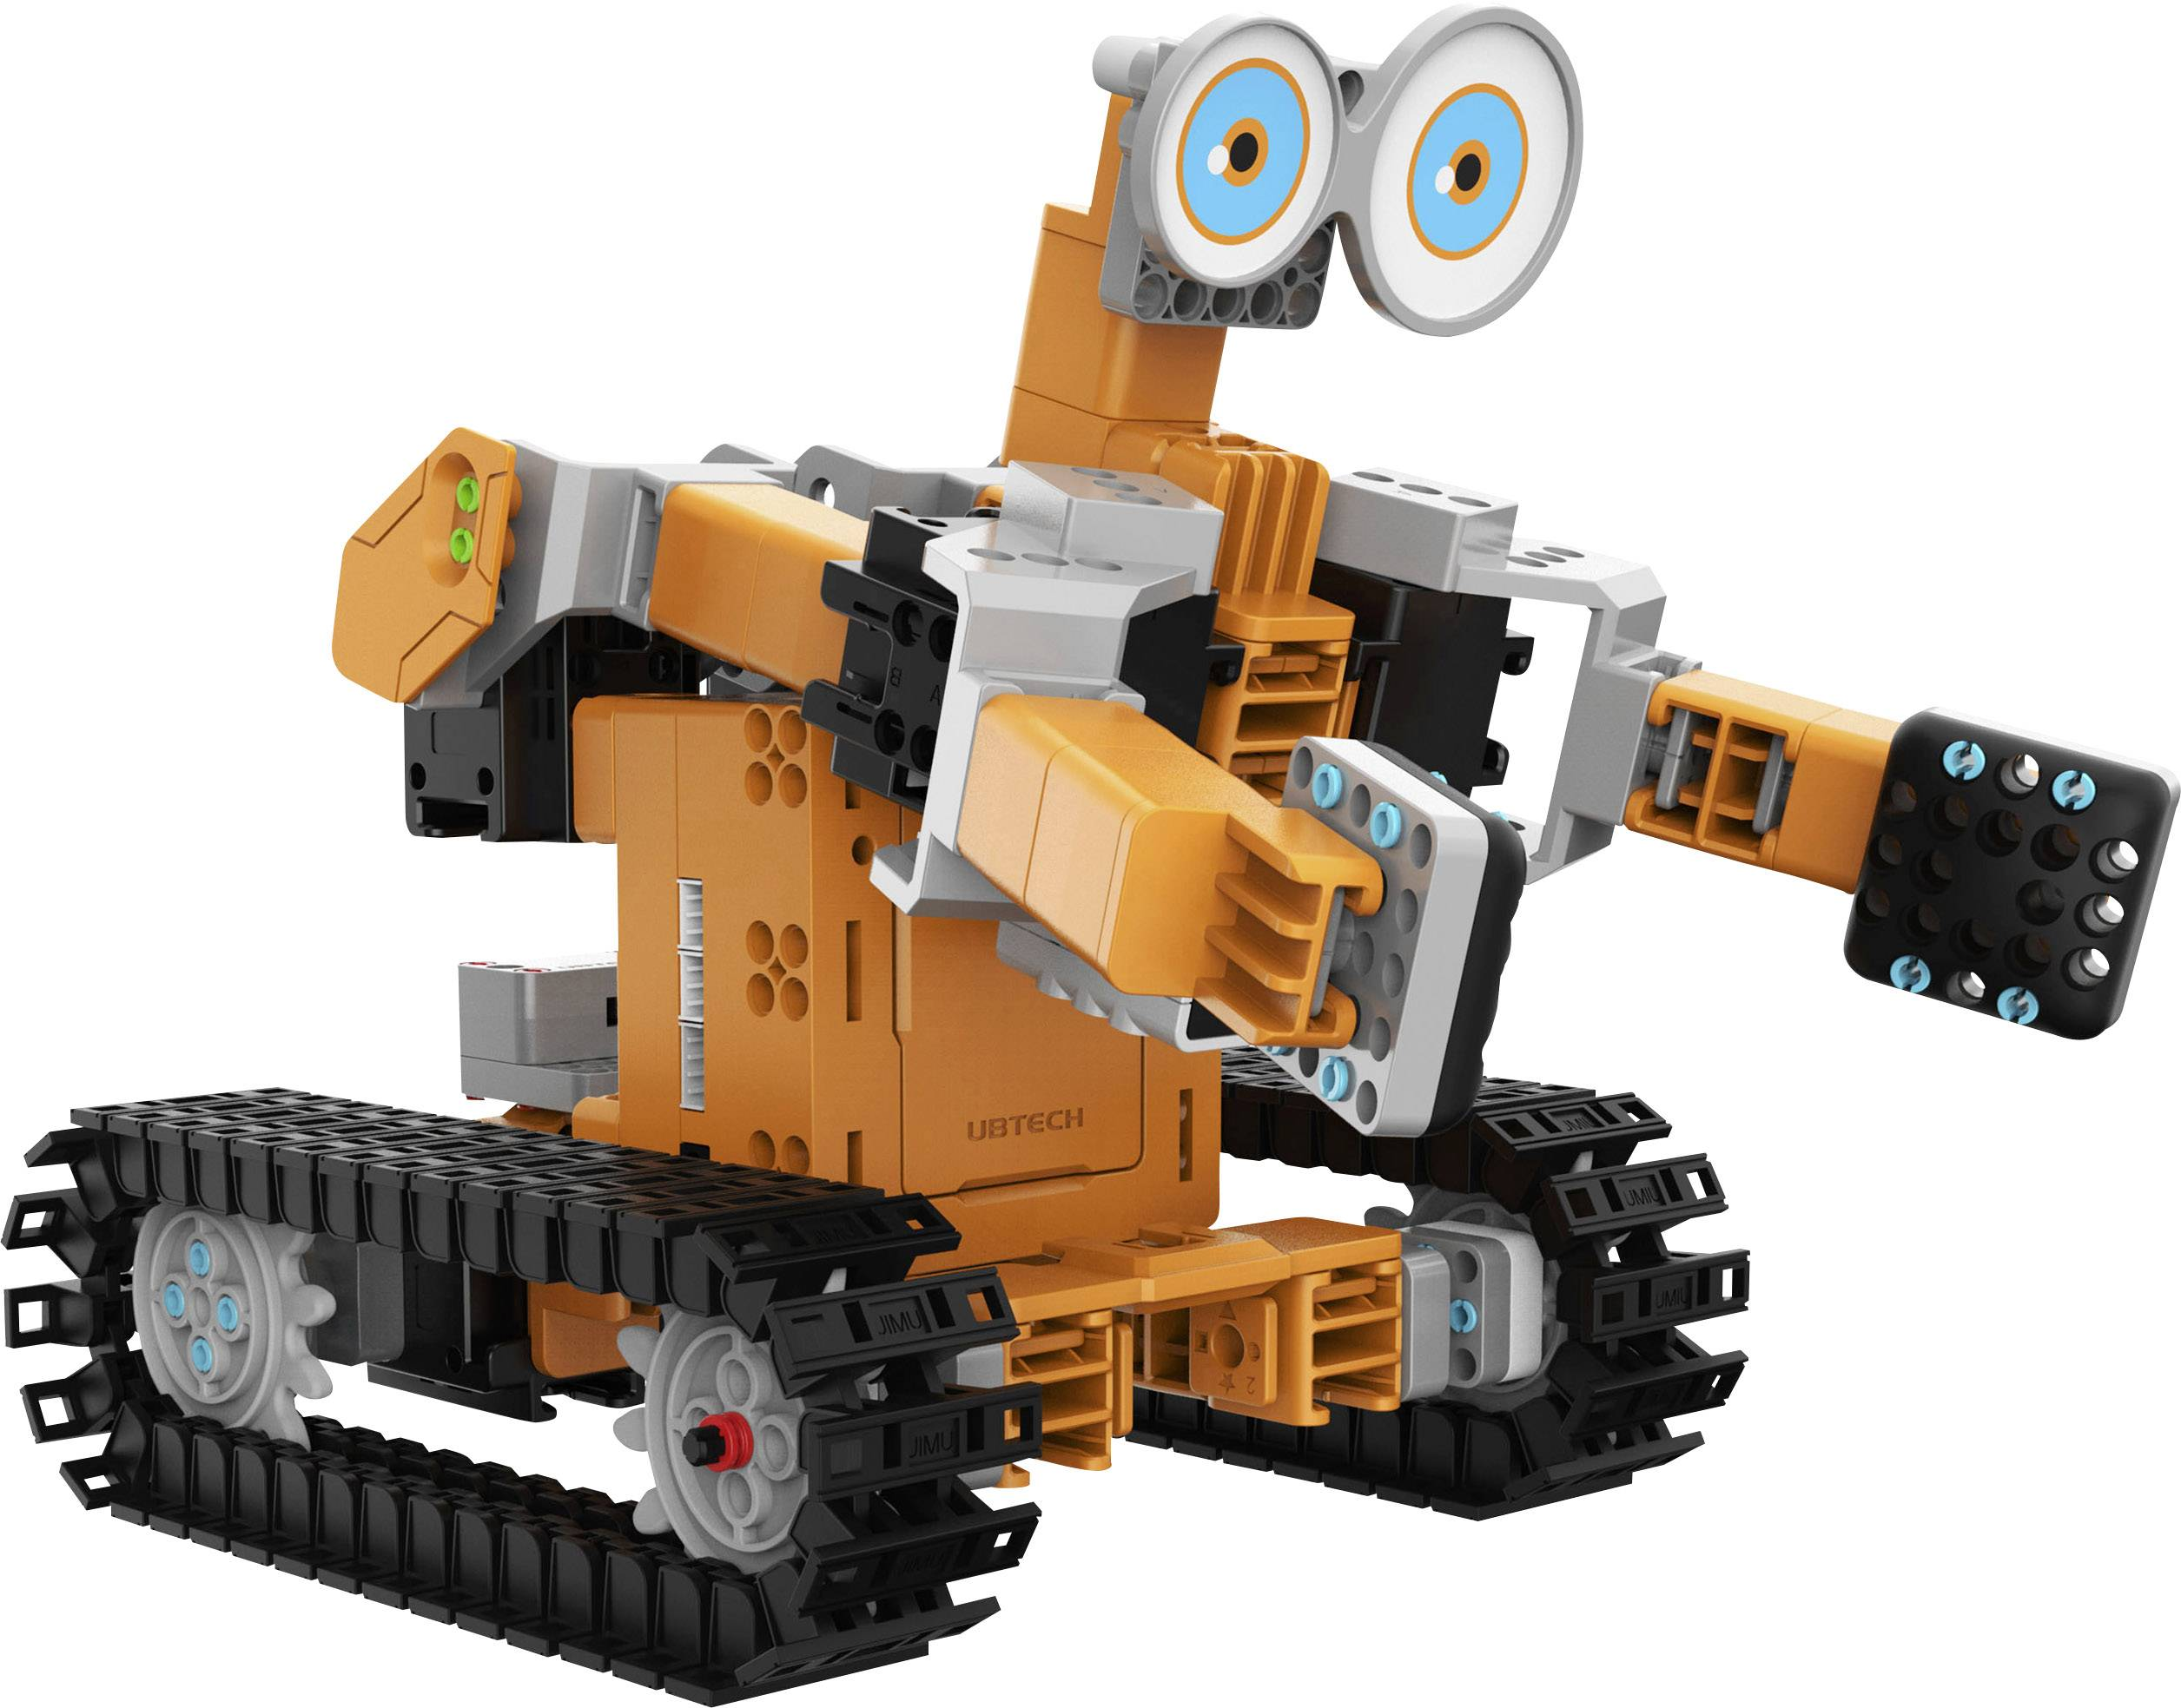 Stavebnice robota Ubtech Jimu Robot TankBot Kit